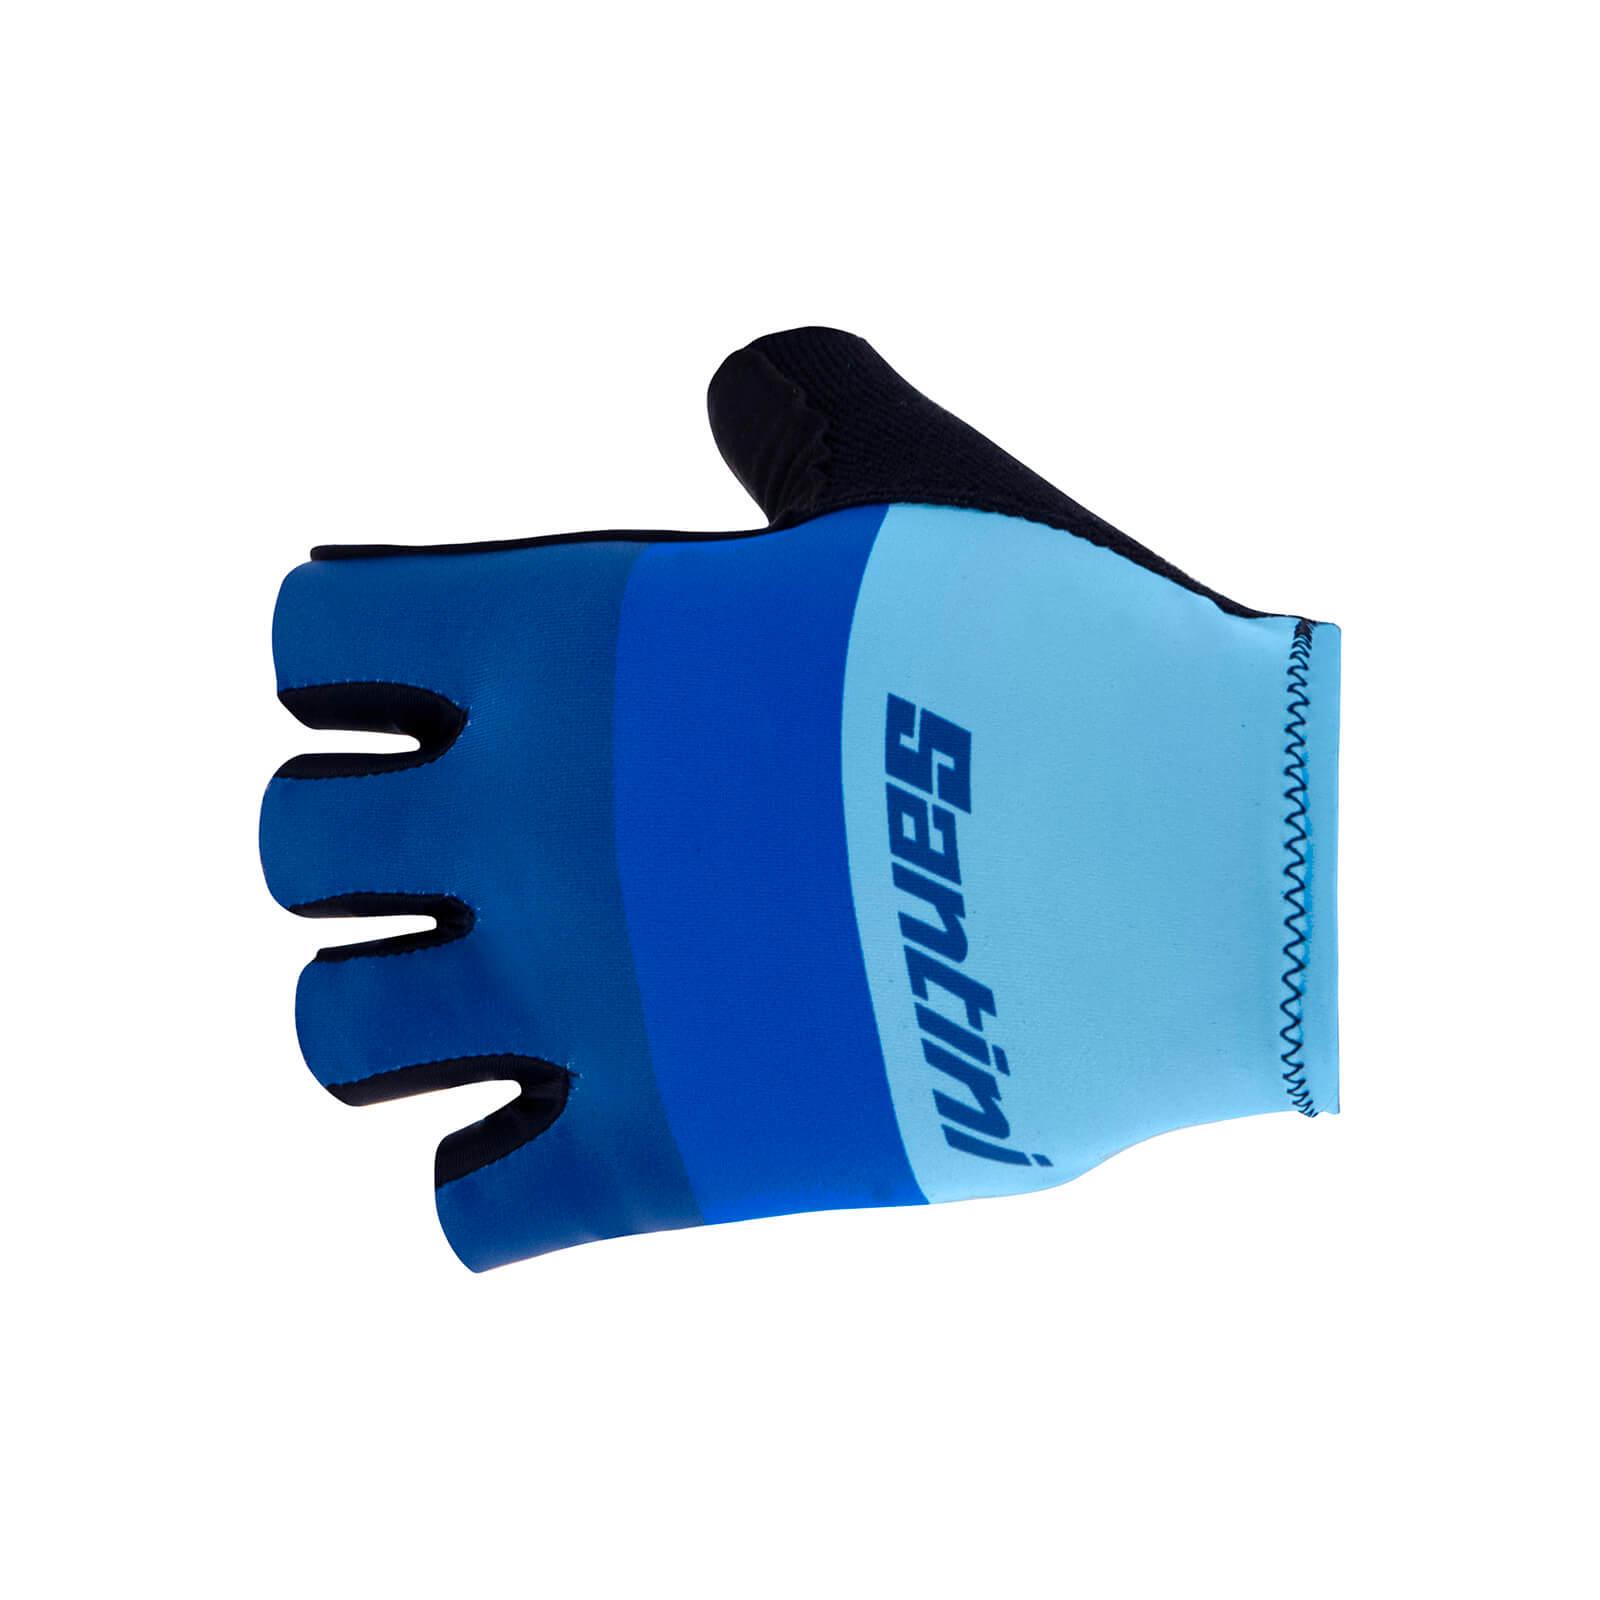 Santini La Vuelta 2021 Gamoniteiru Summer Gloves - L